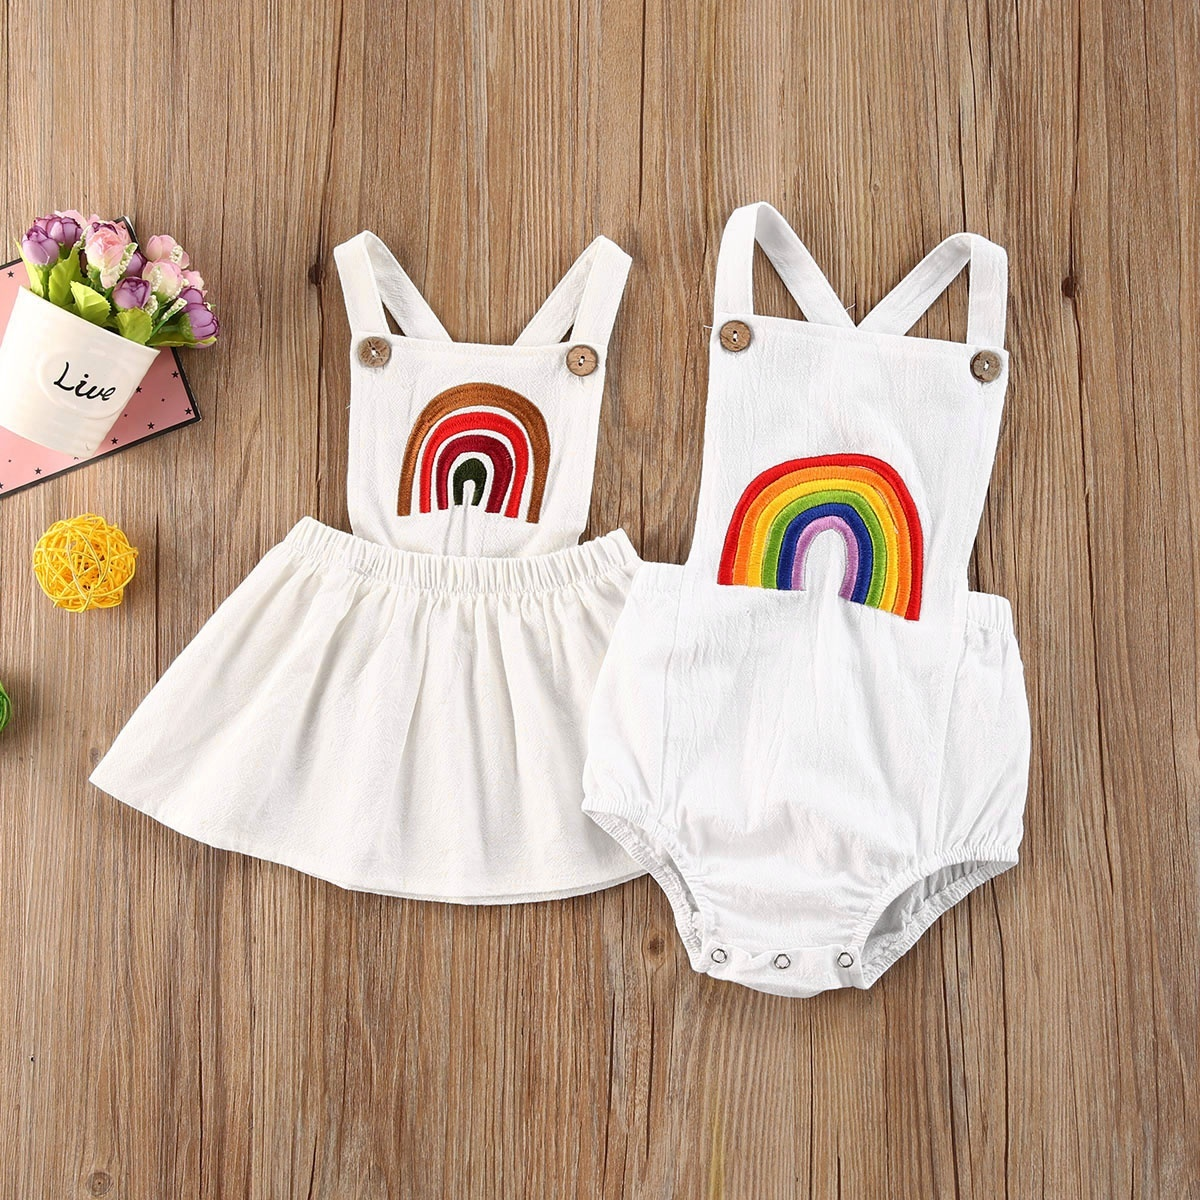 0-24M Summer Newborn Rainbow Sleeveless Romper Jumpsuit Cotton Summer Clothes Dropshipping